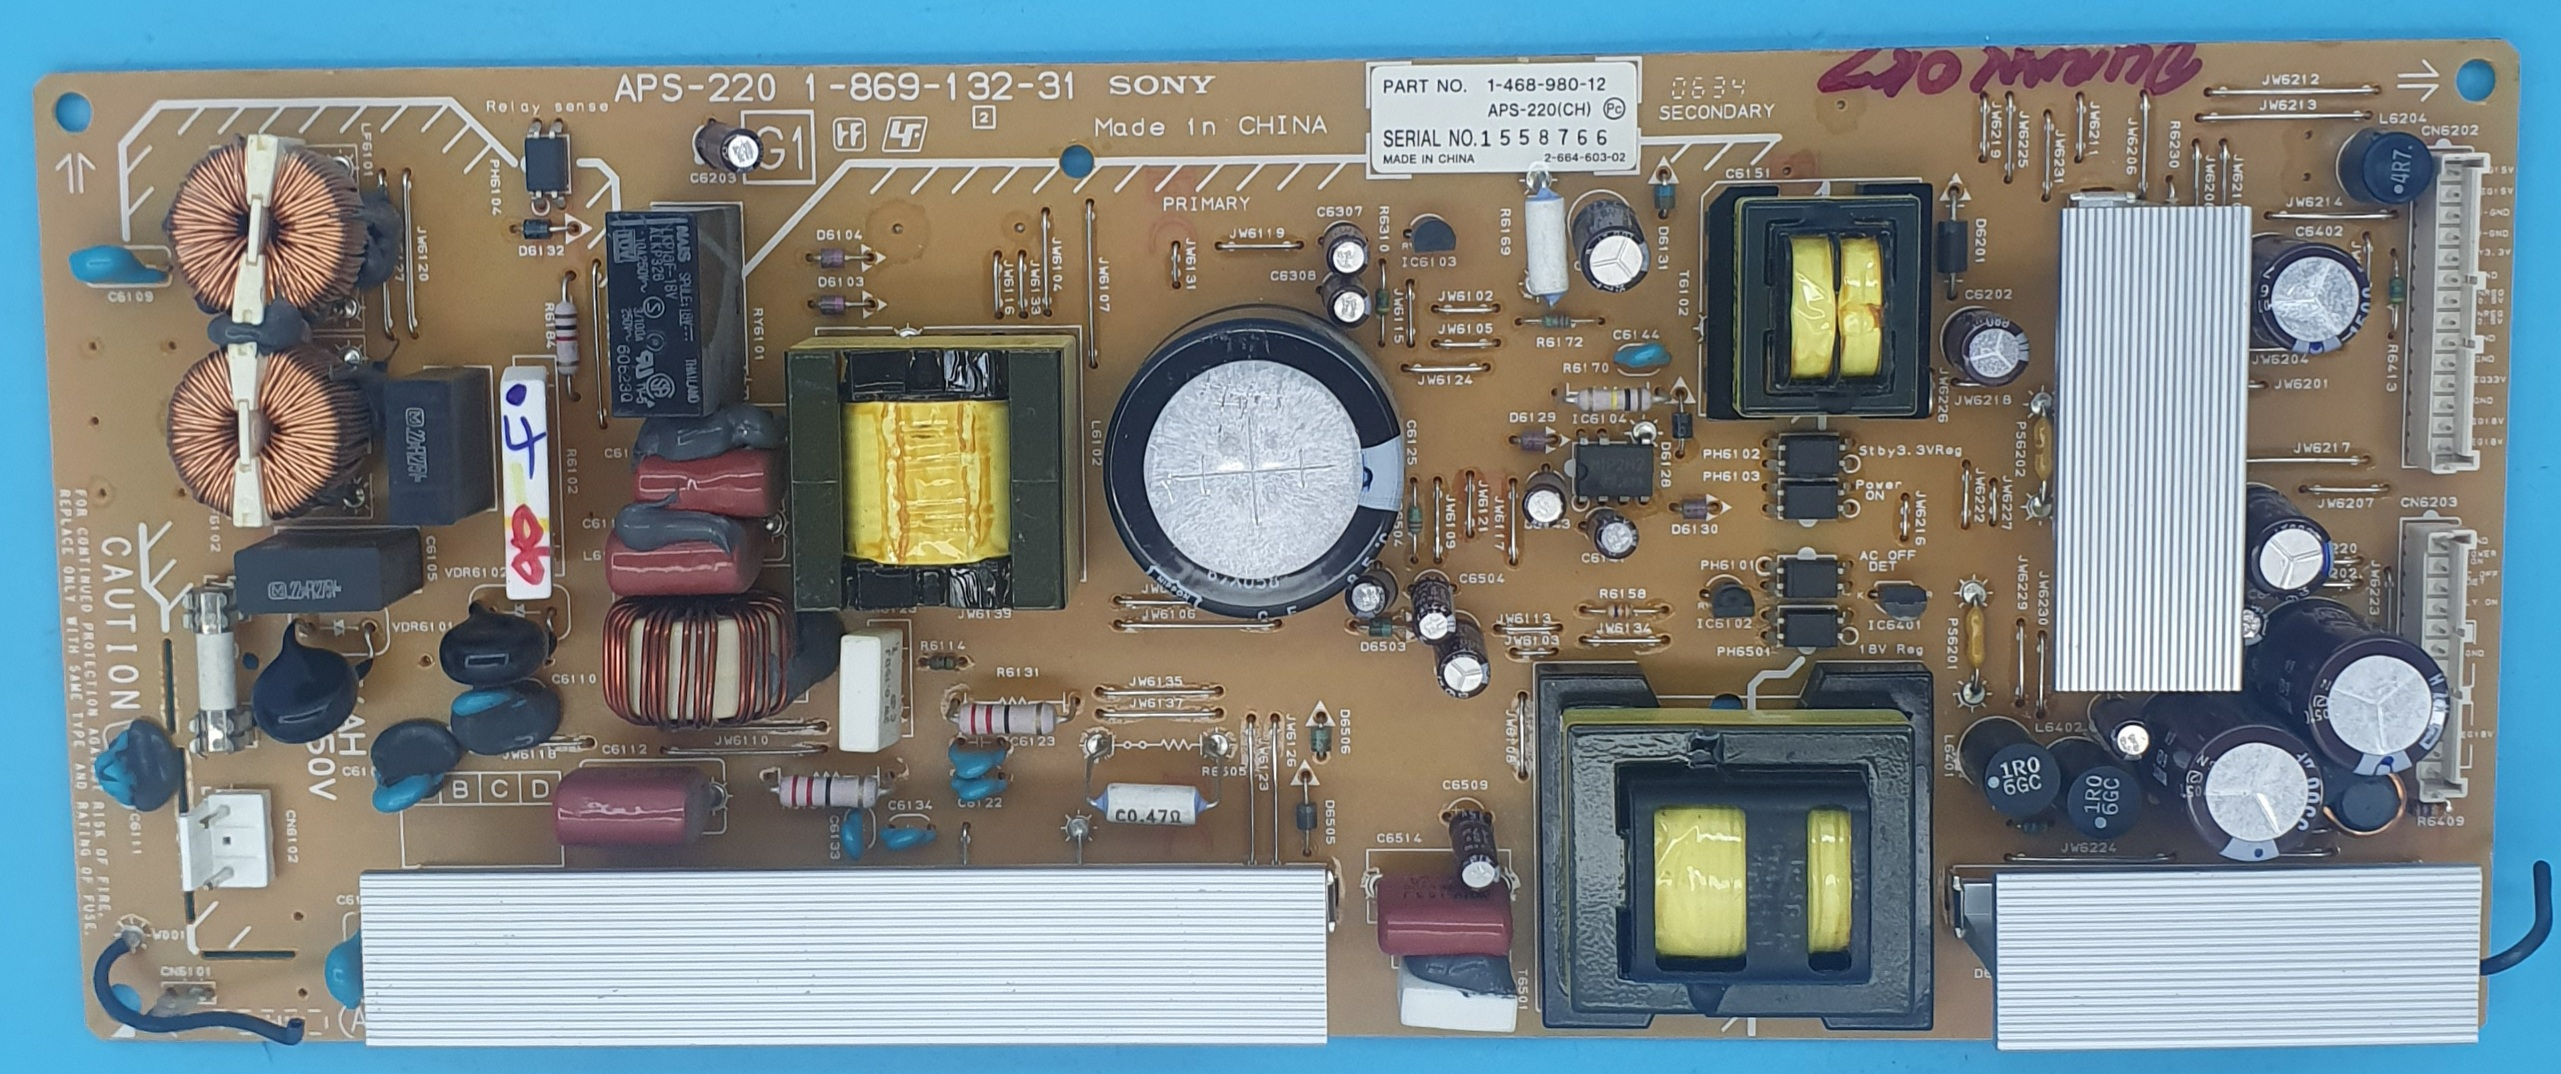 1-869-132-31 Sony Power (KDV DAHİL = 100 TL)